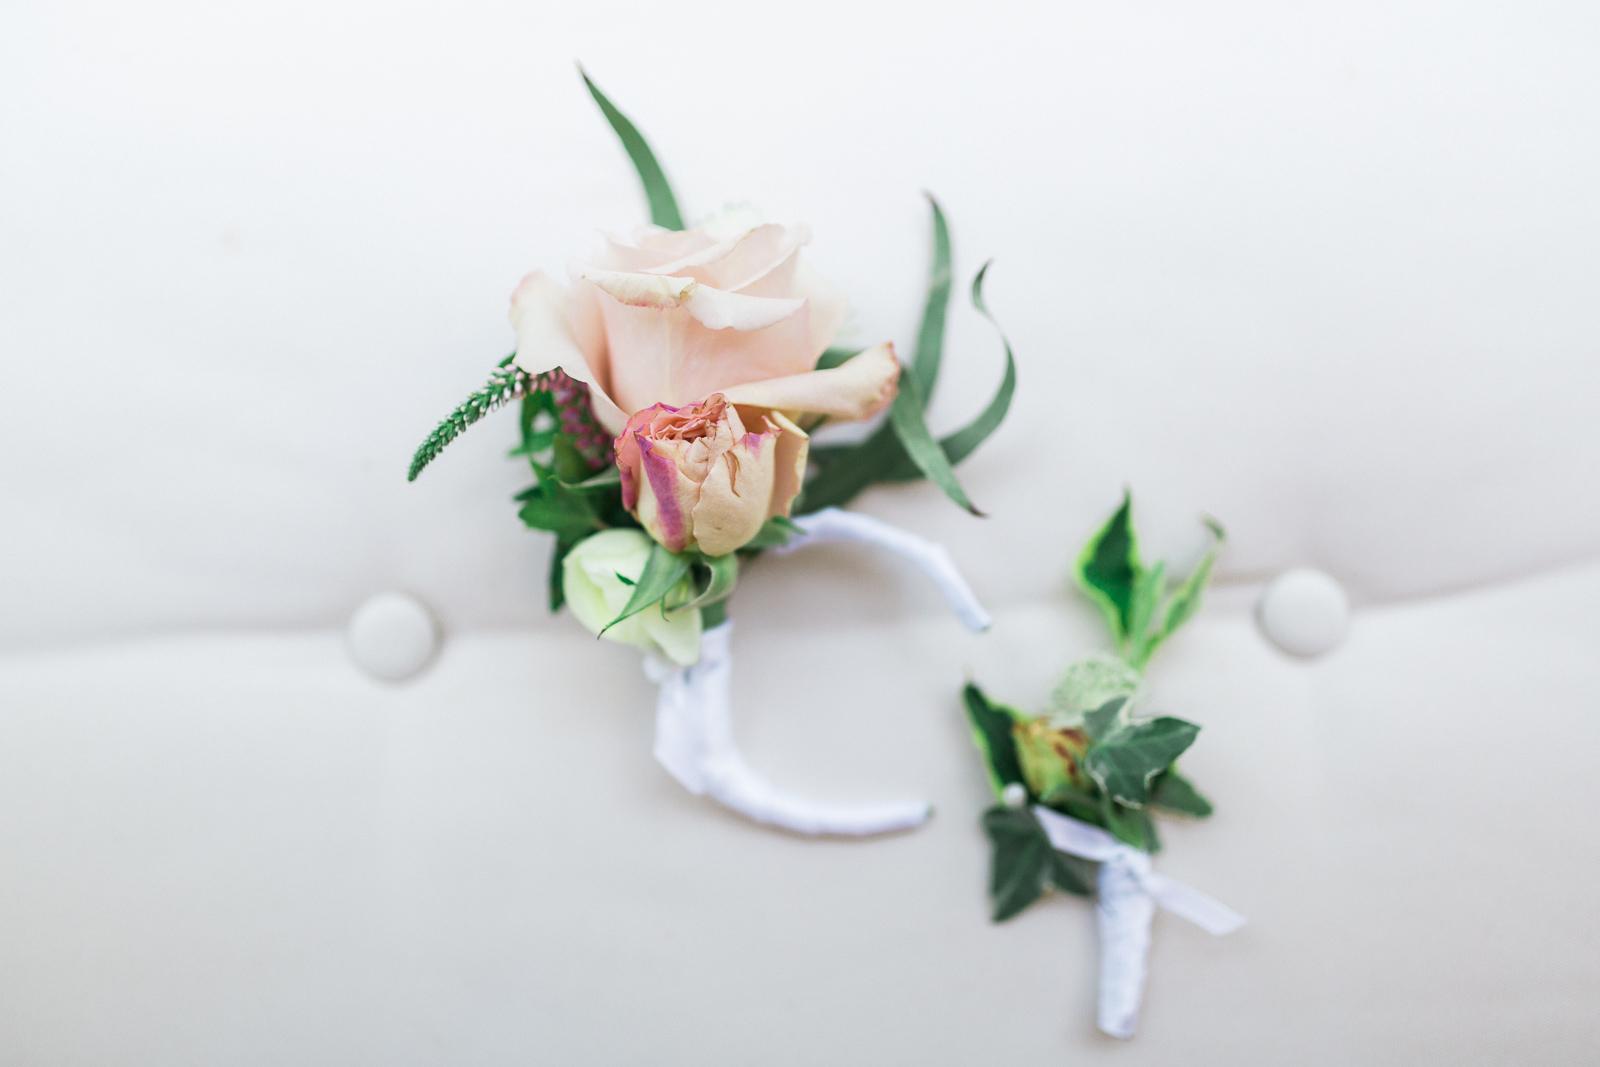 Floral decor for a gay wedding in Santa Barbara